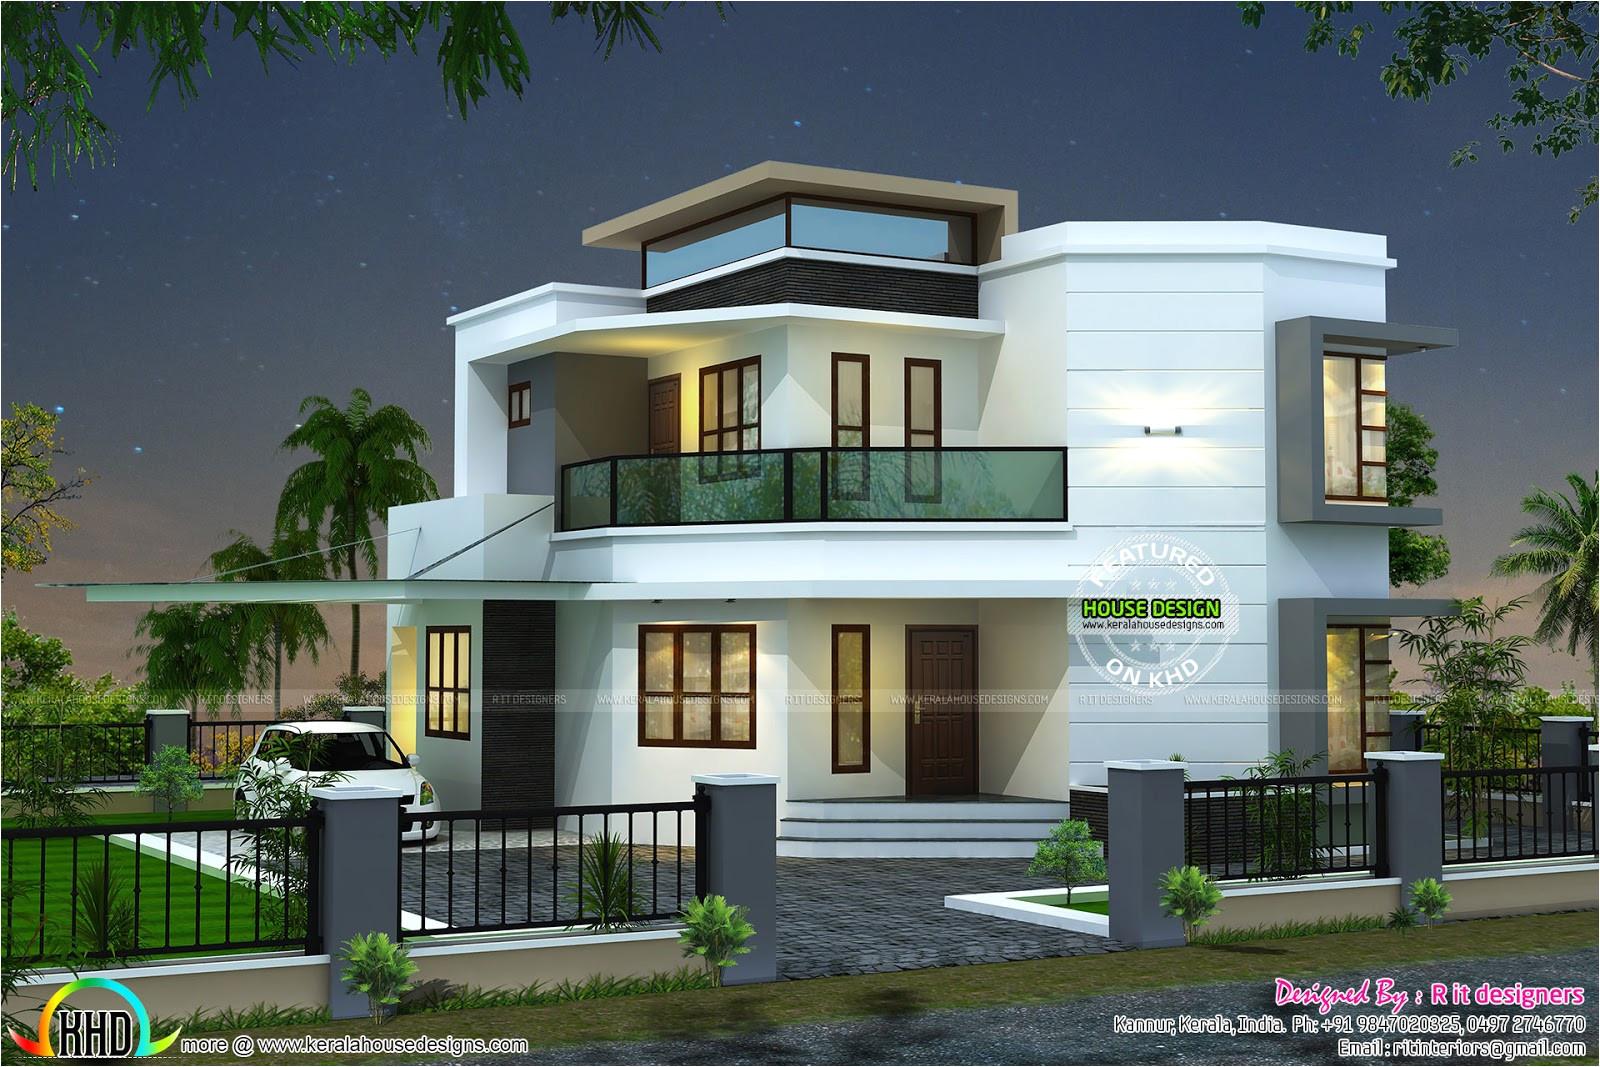 Home Plan Design Ideas 1838 Sq Ft Cute Modern House Kerala Home Design and